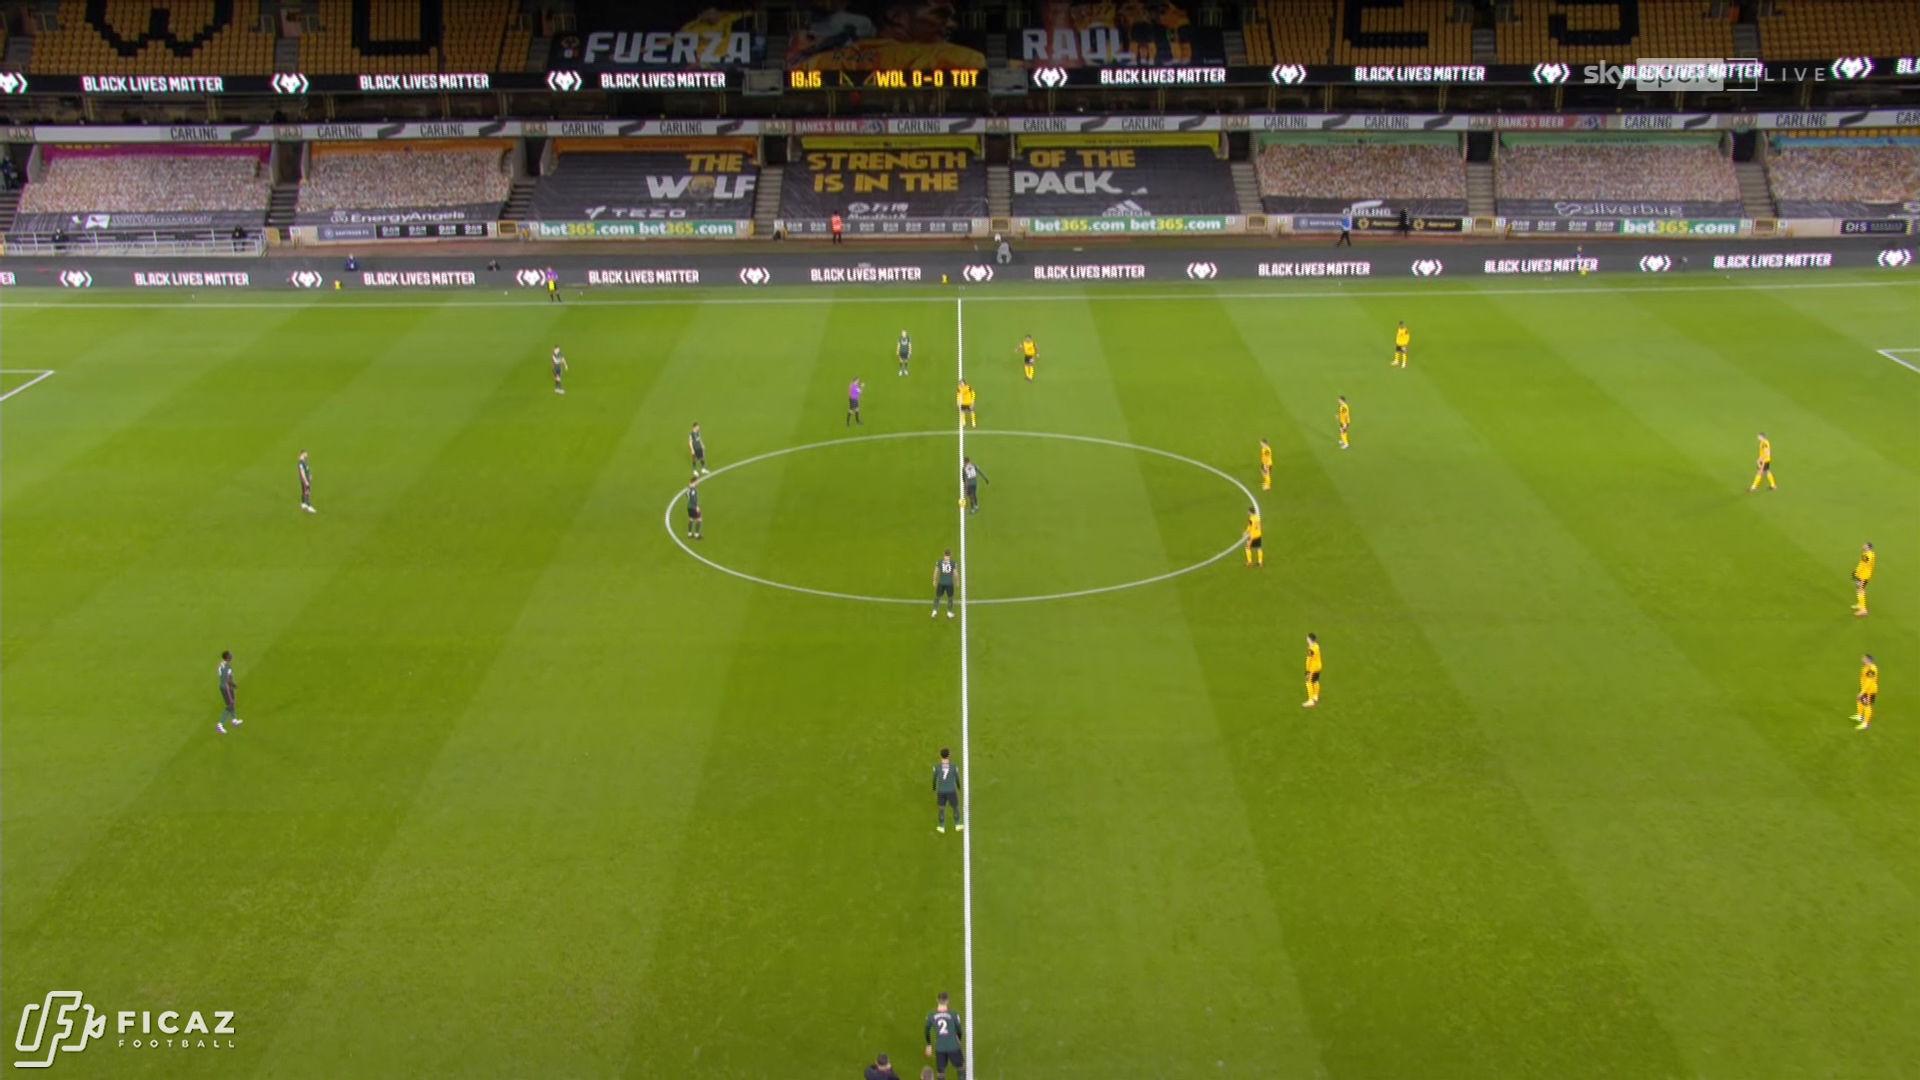 Wolverhampton Wanderers F.C. - Main